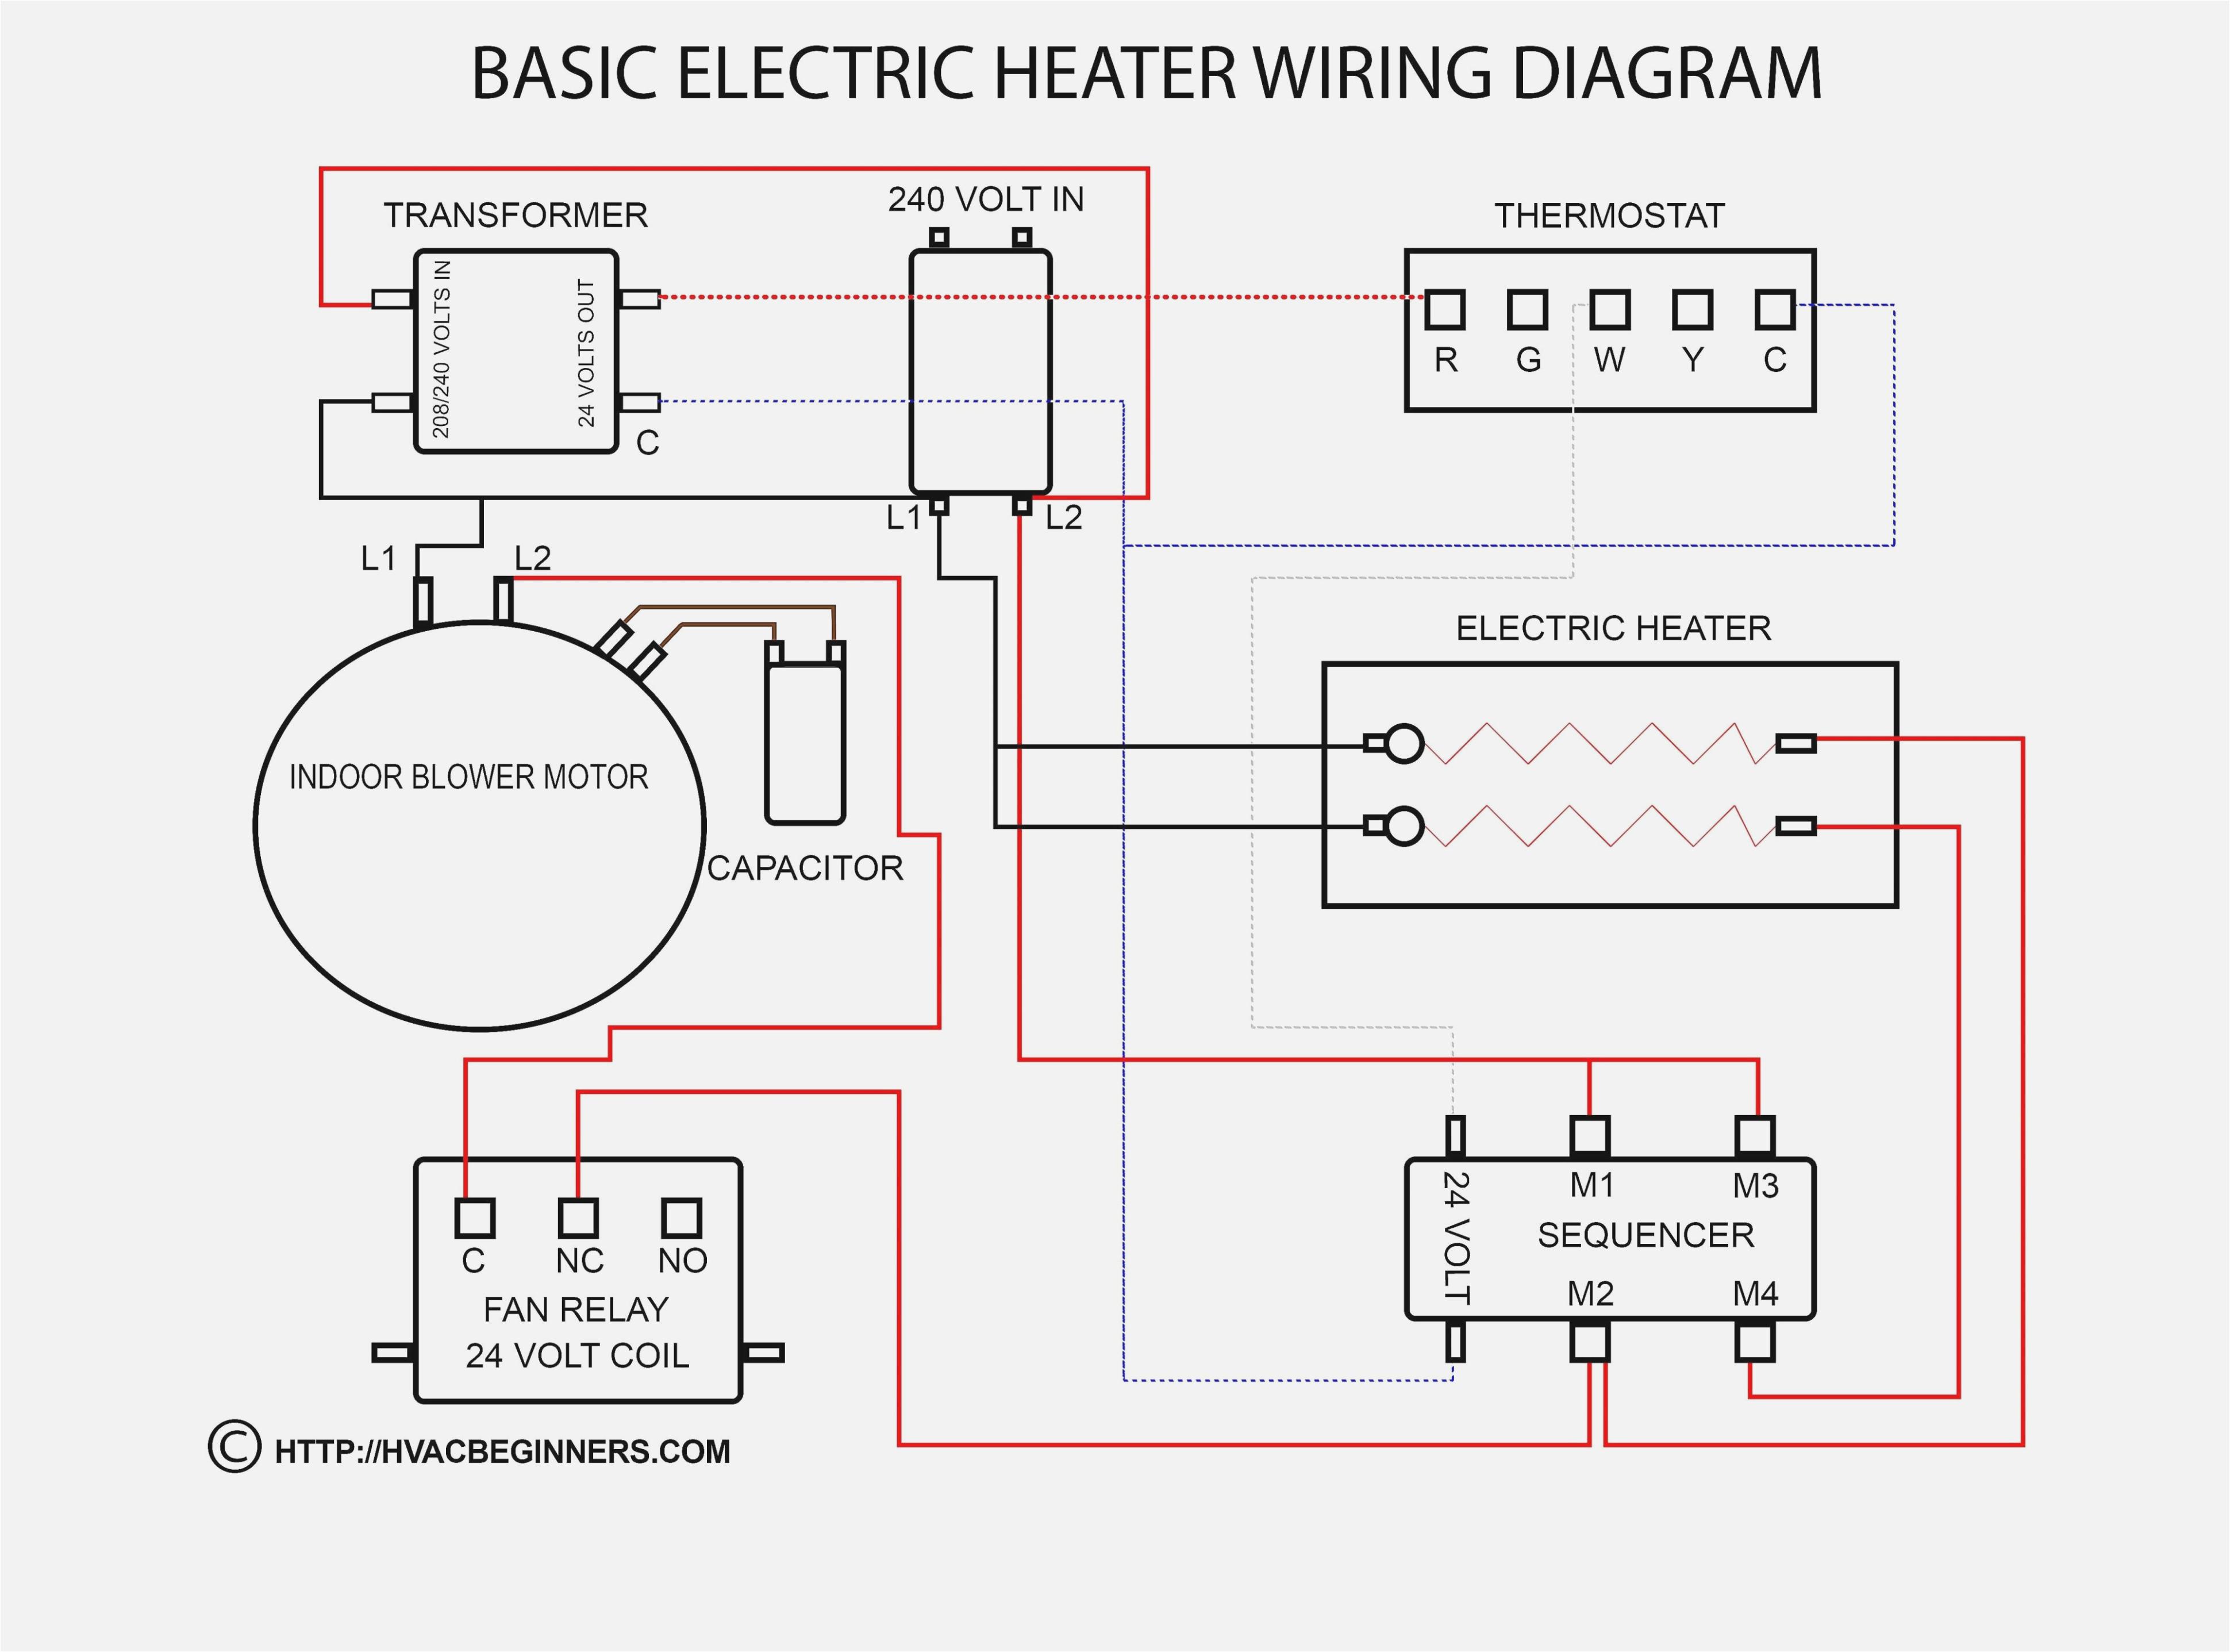 wiring diagrams ta2awc baseboard heater wiring diagram go ta2awc thermostat wiring diagram ta2anwc wiring diagram